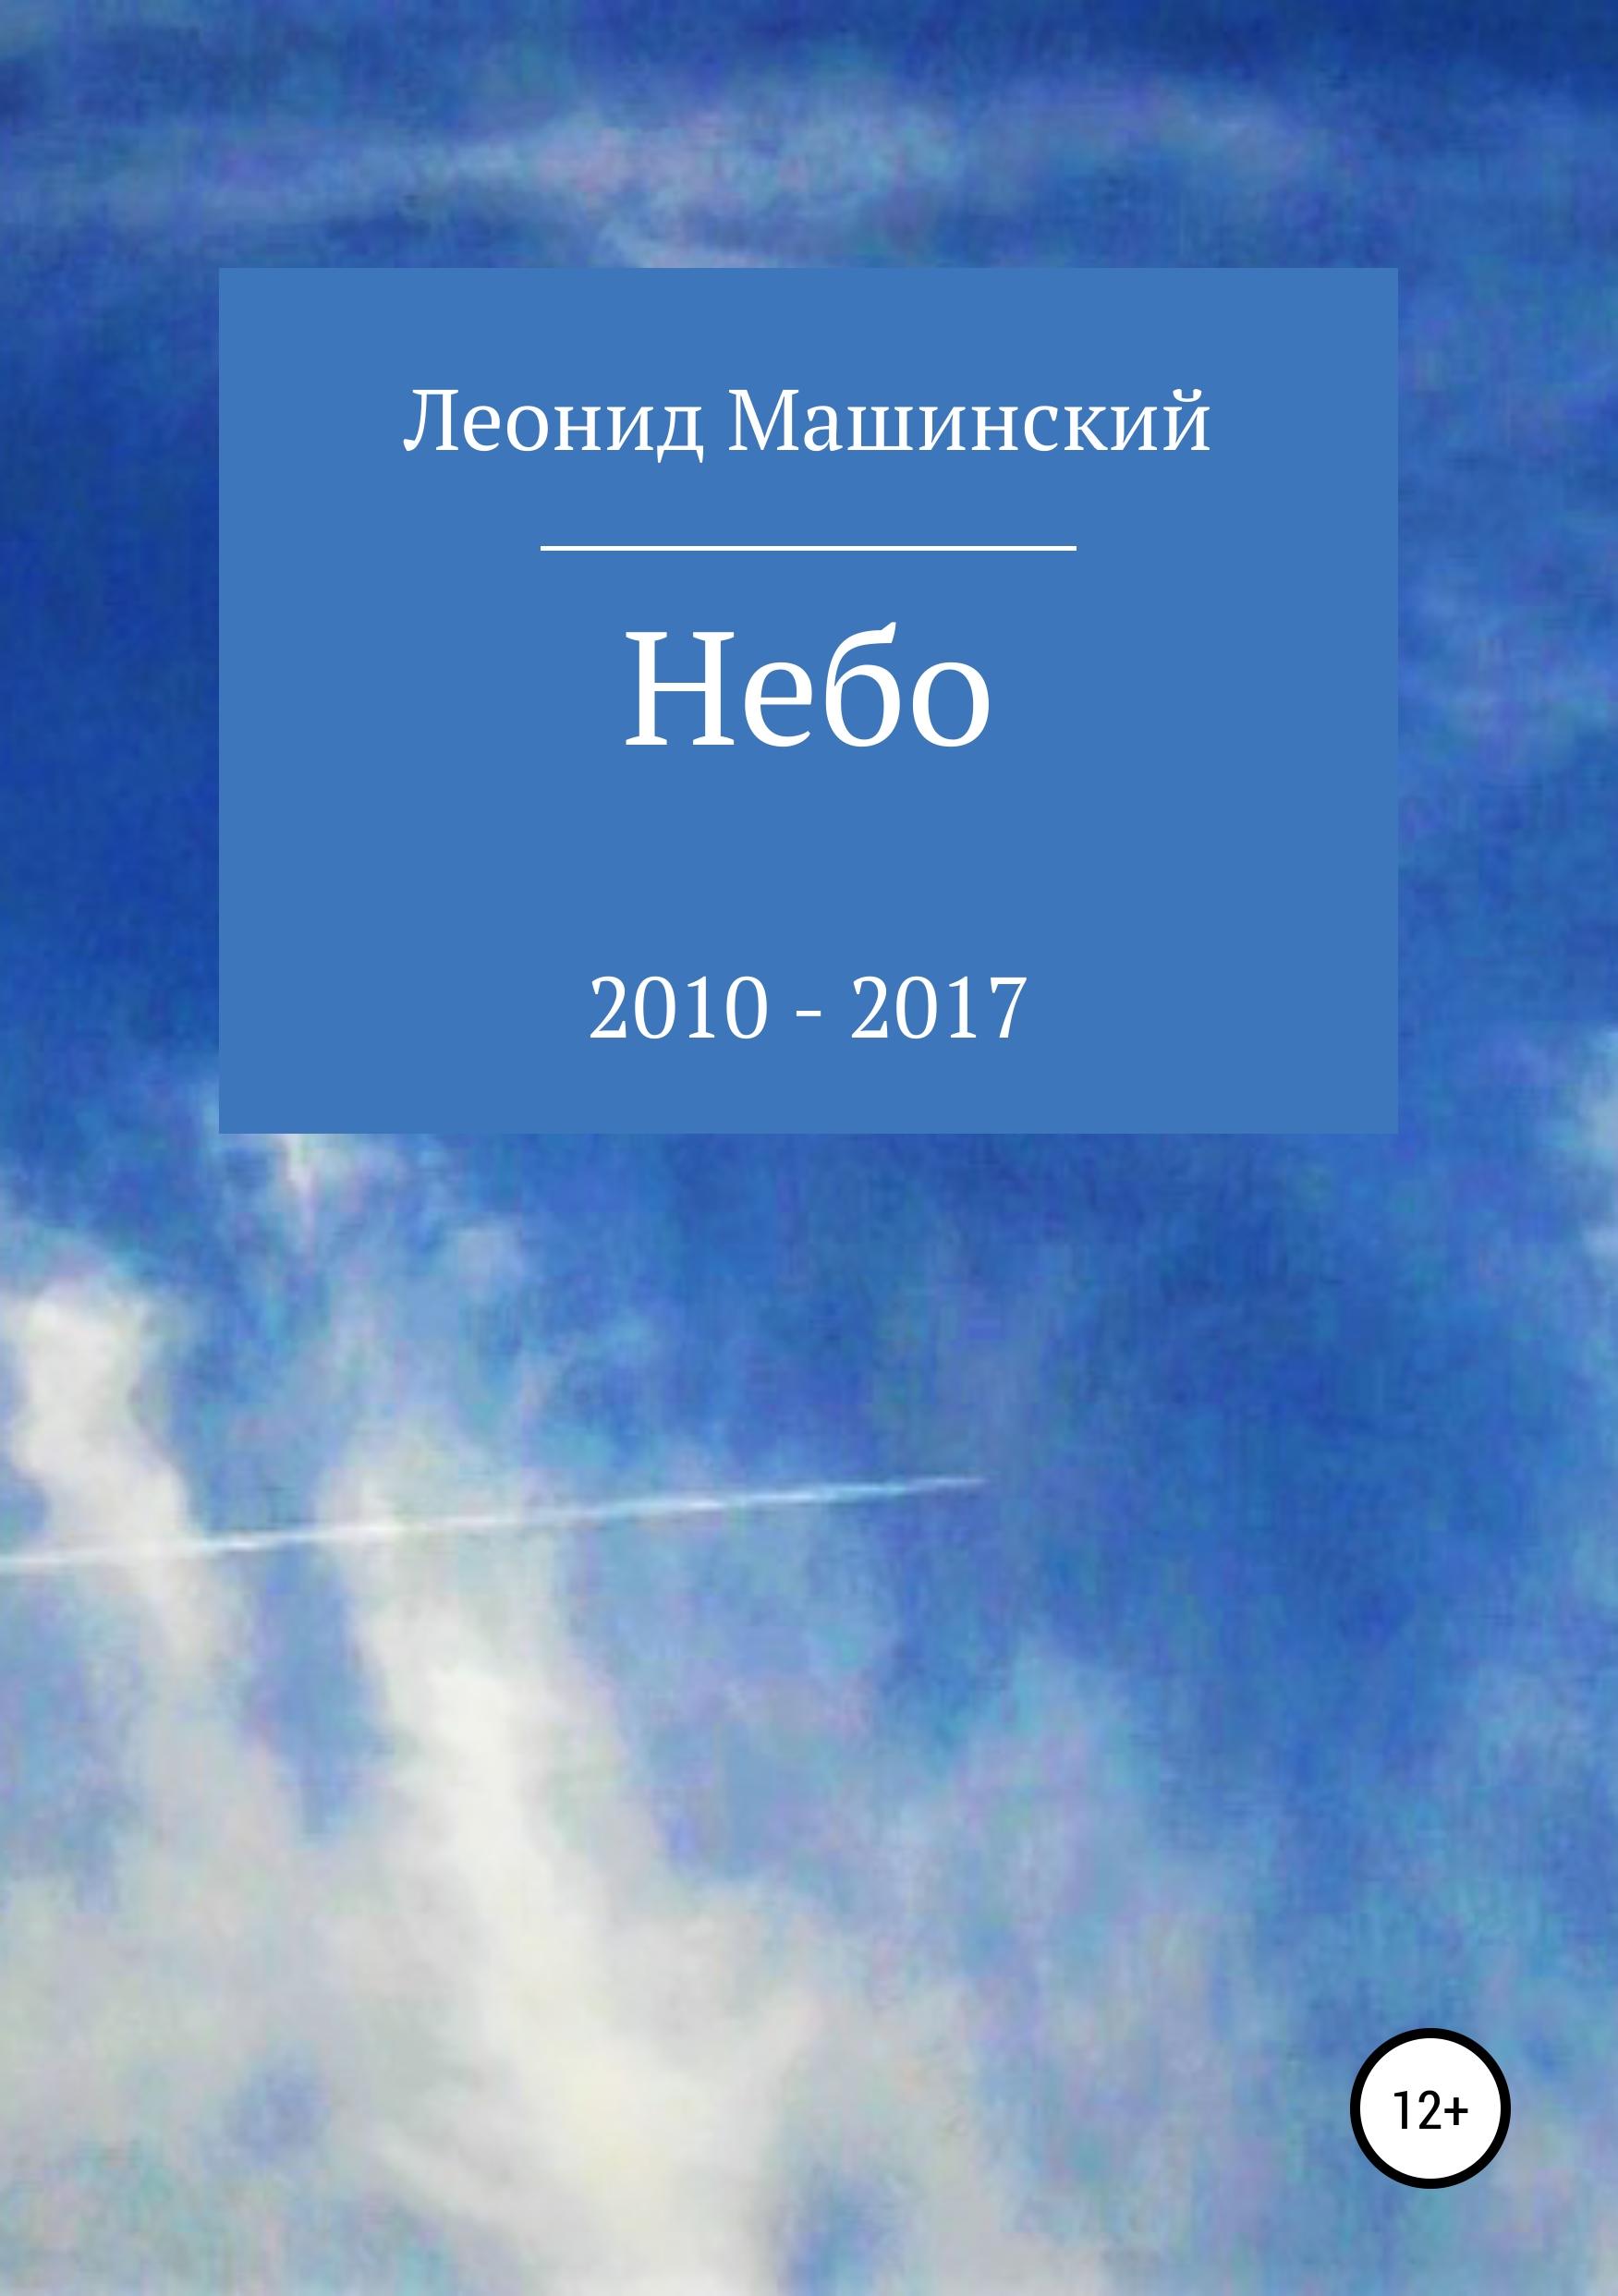 Леонид Александрович Машинский Небо владислав волков шагаем в небо